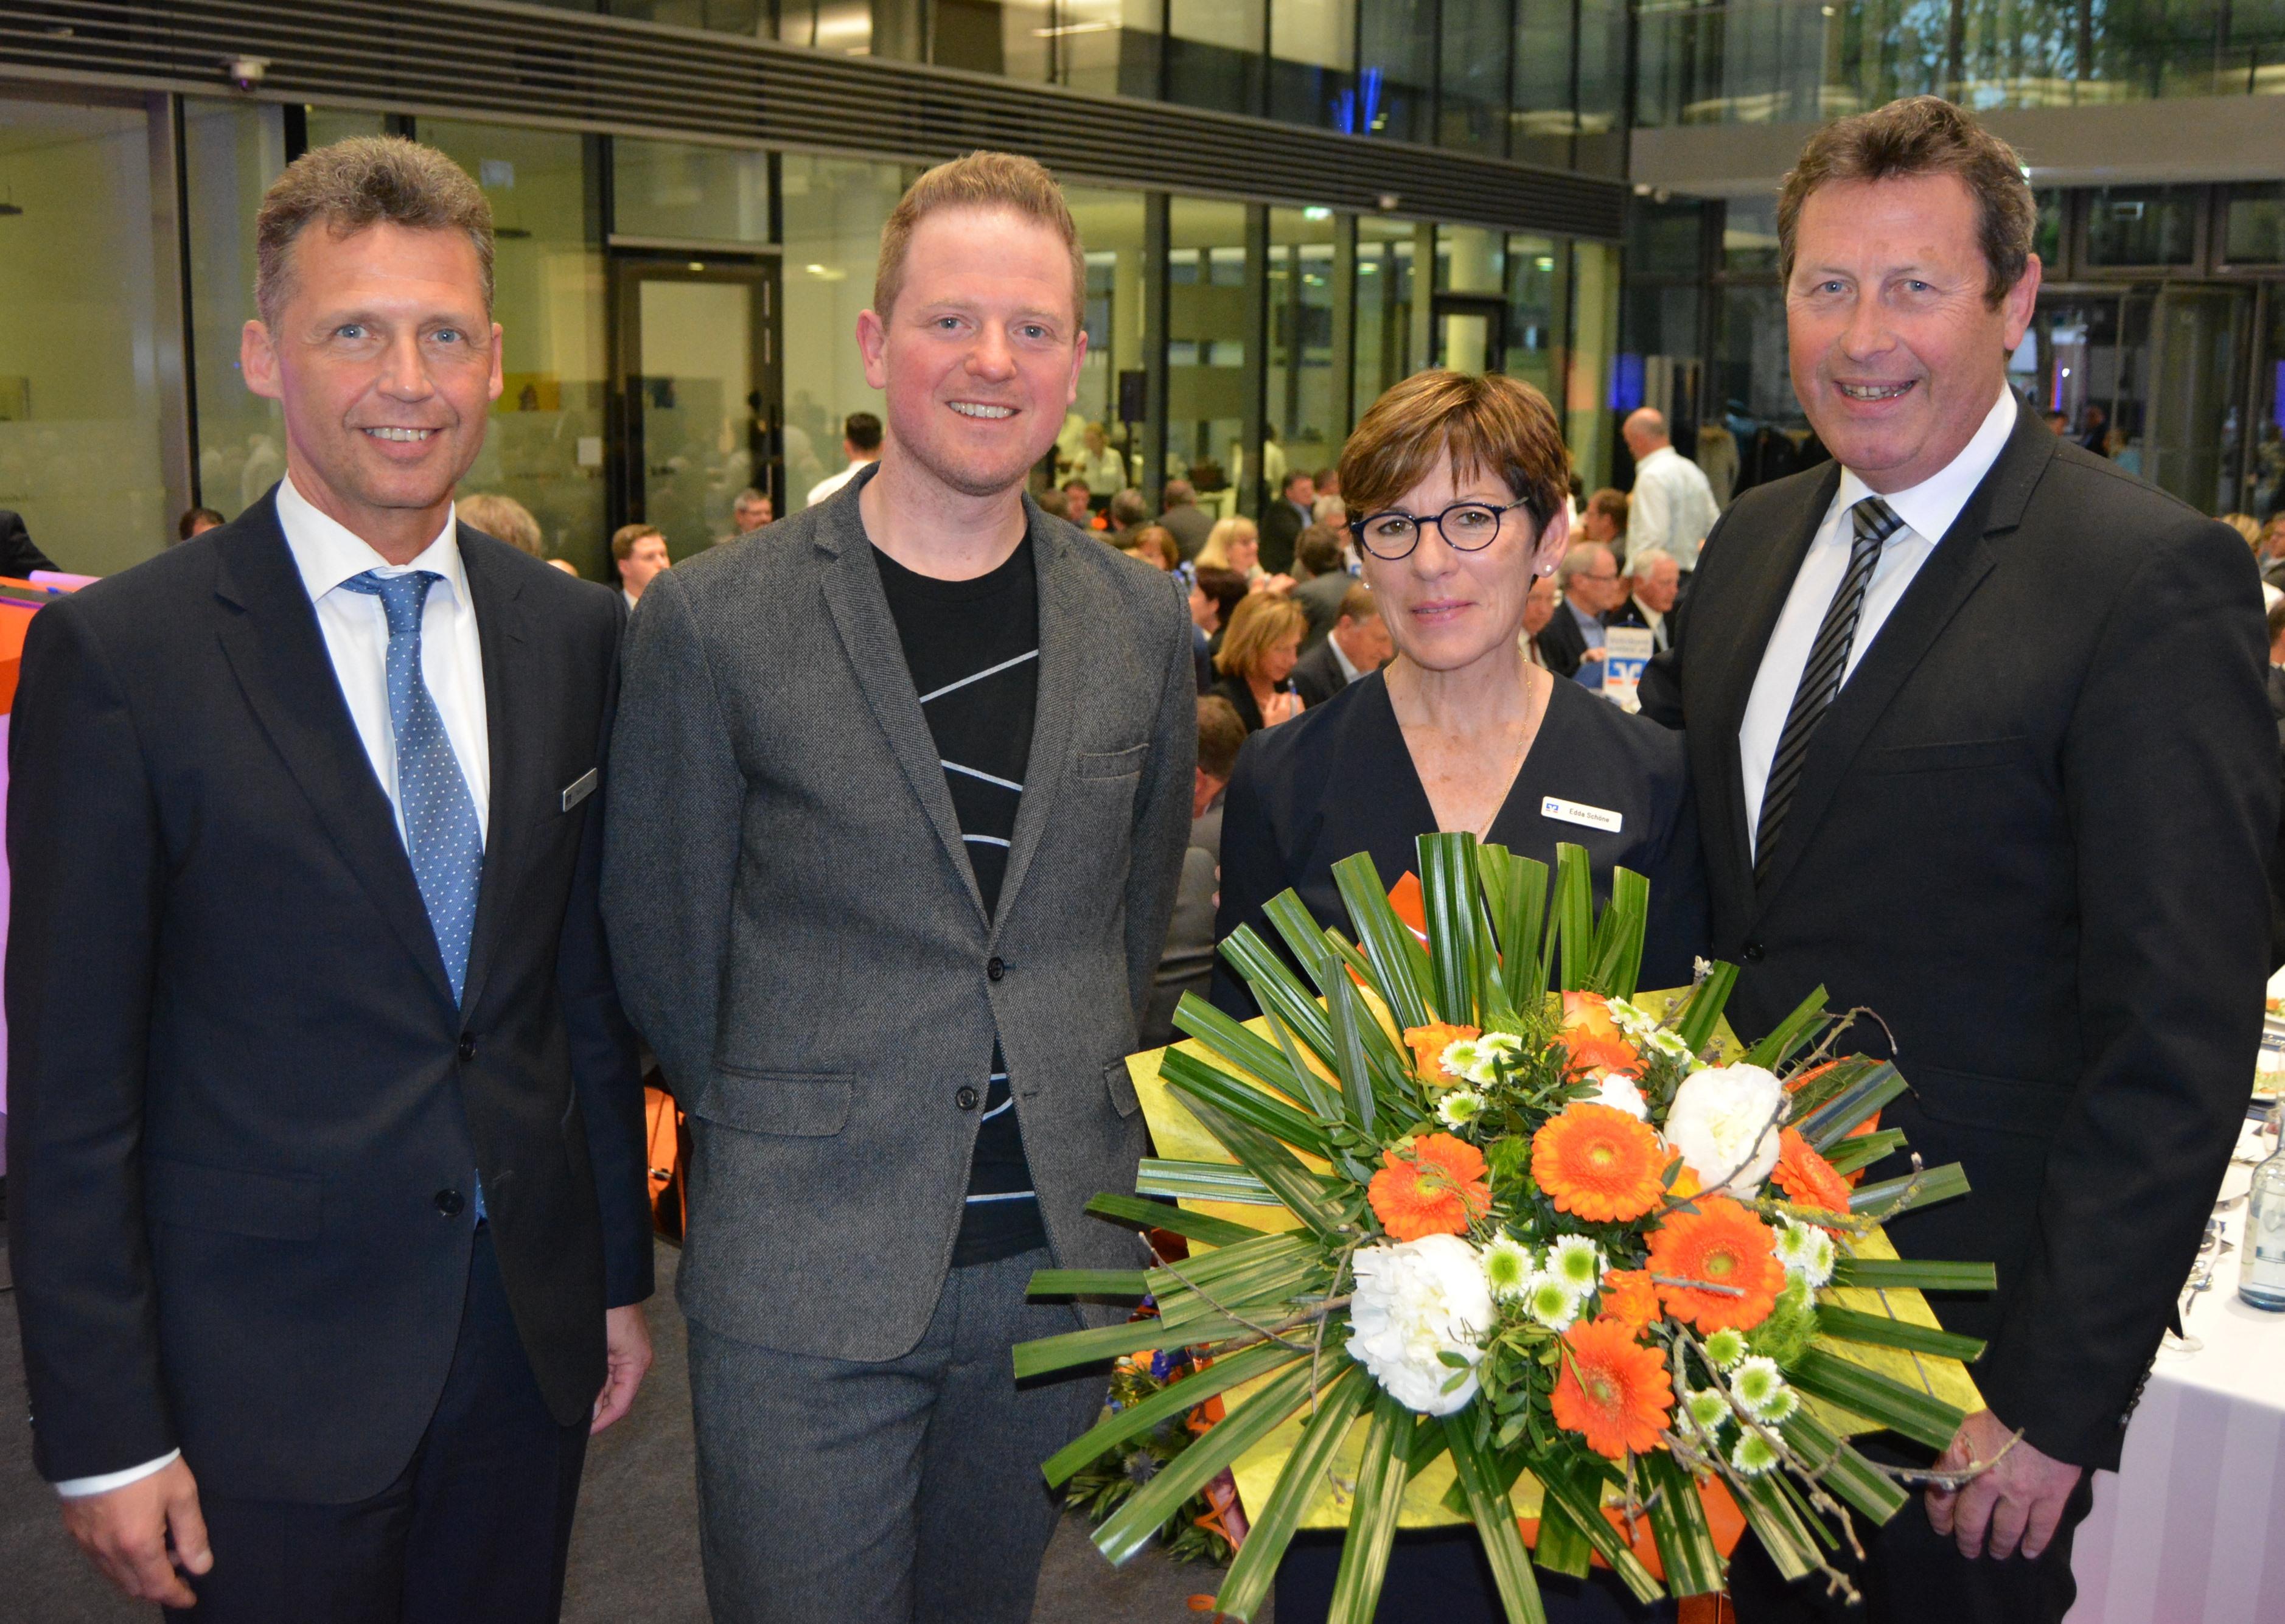 Vertreterversammlung 2019 - Volksbank Krefeld eG